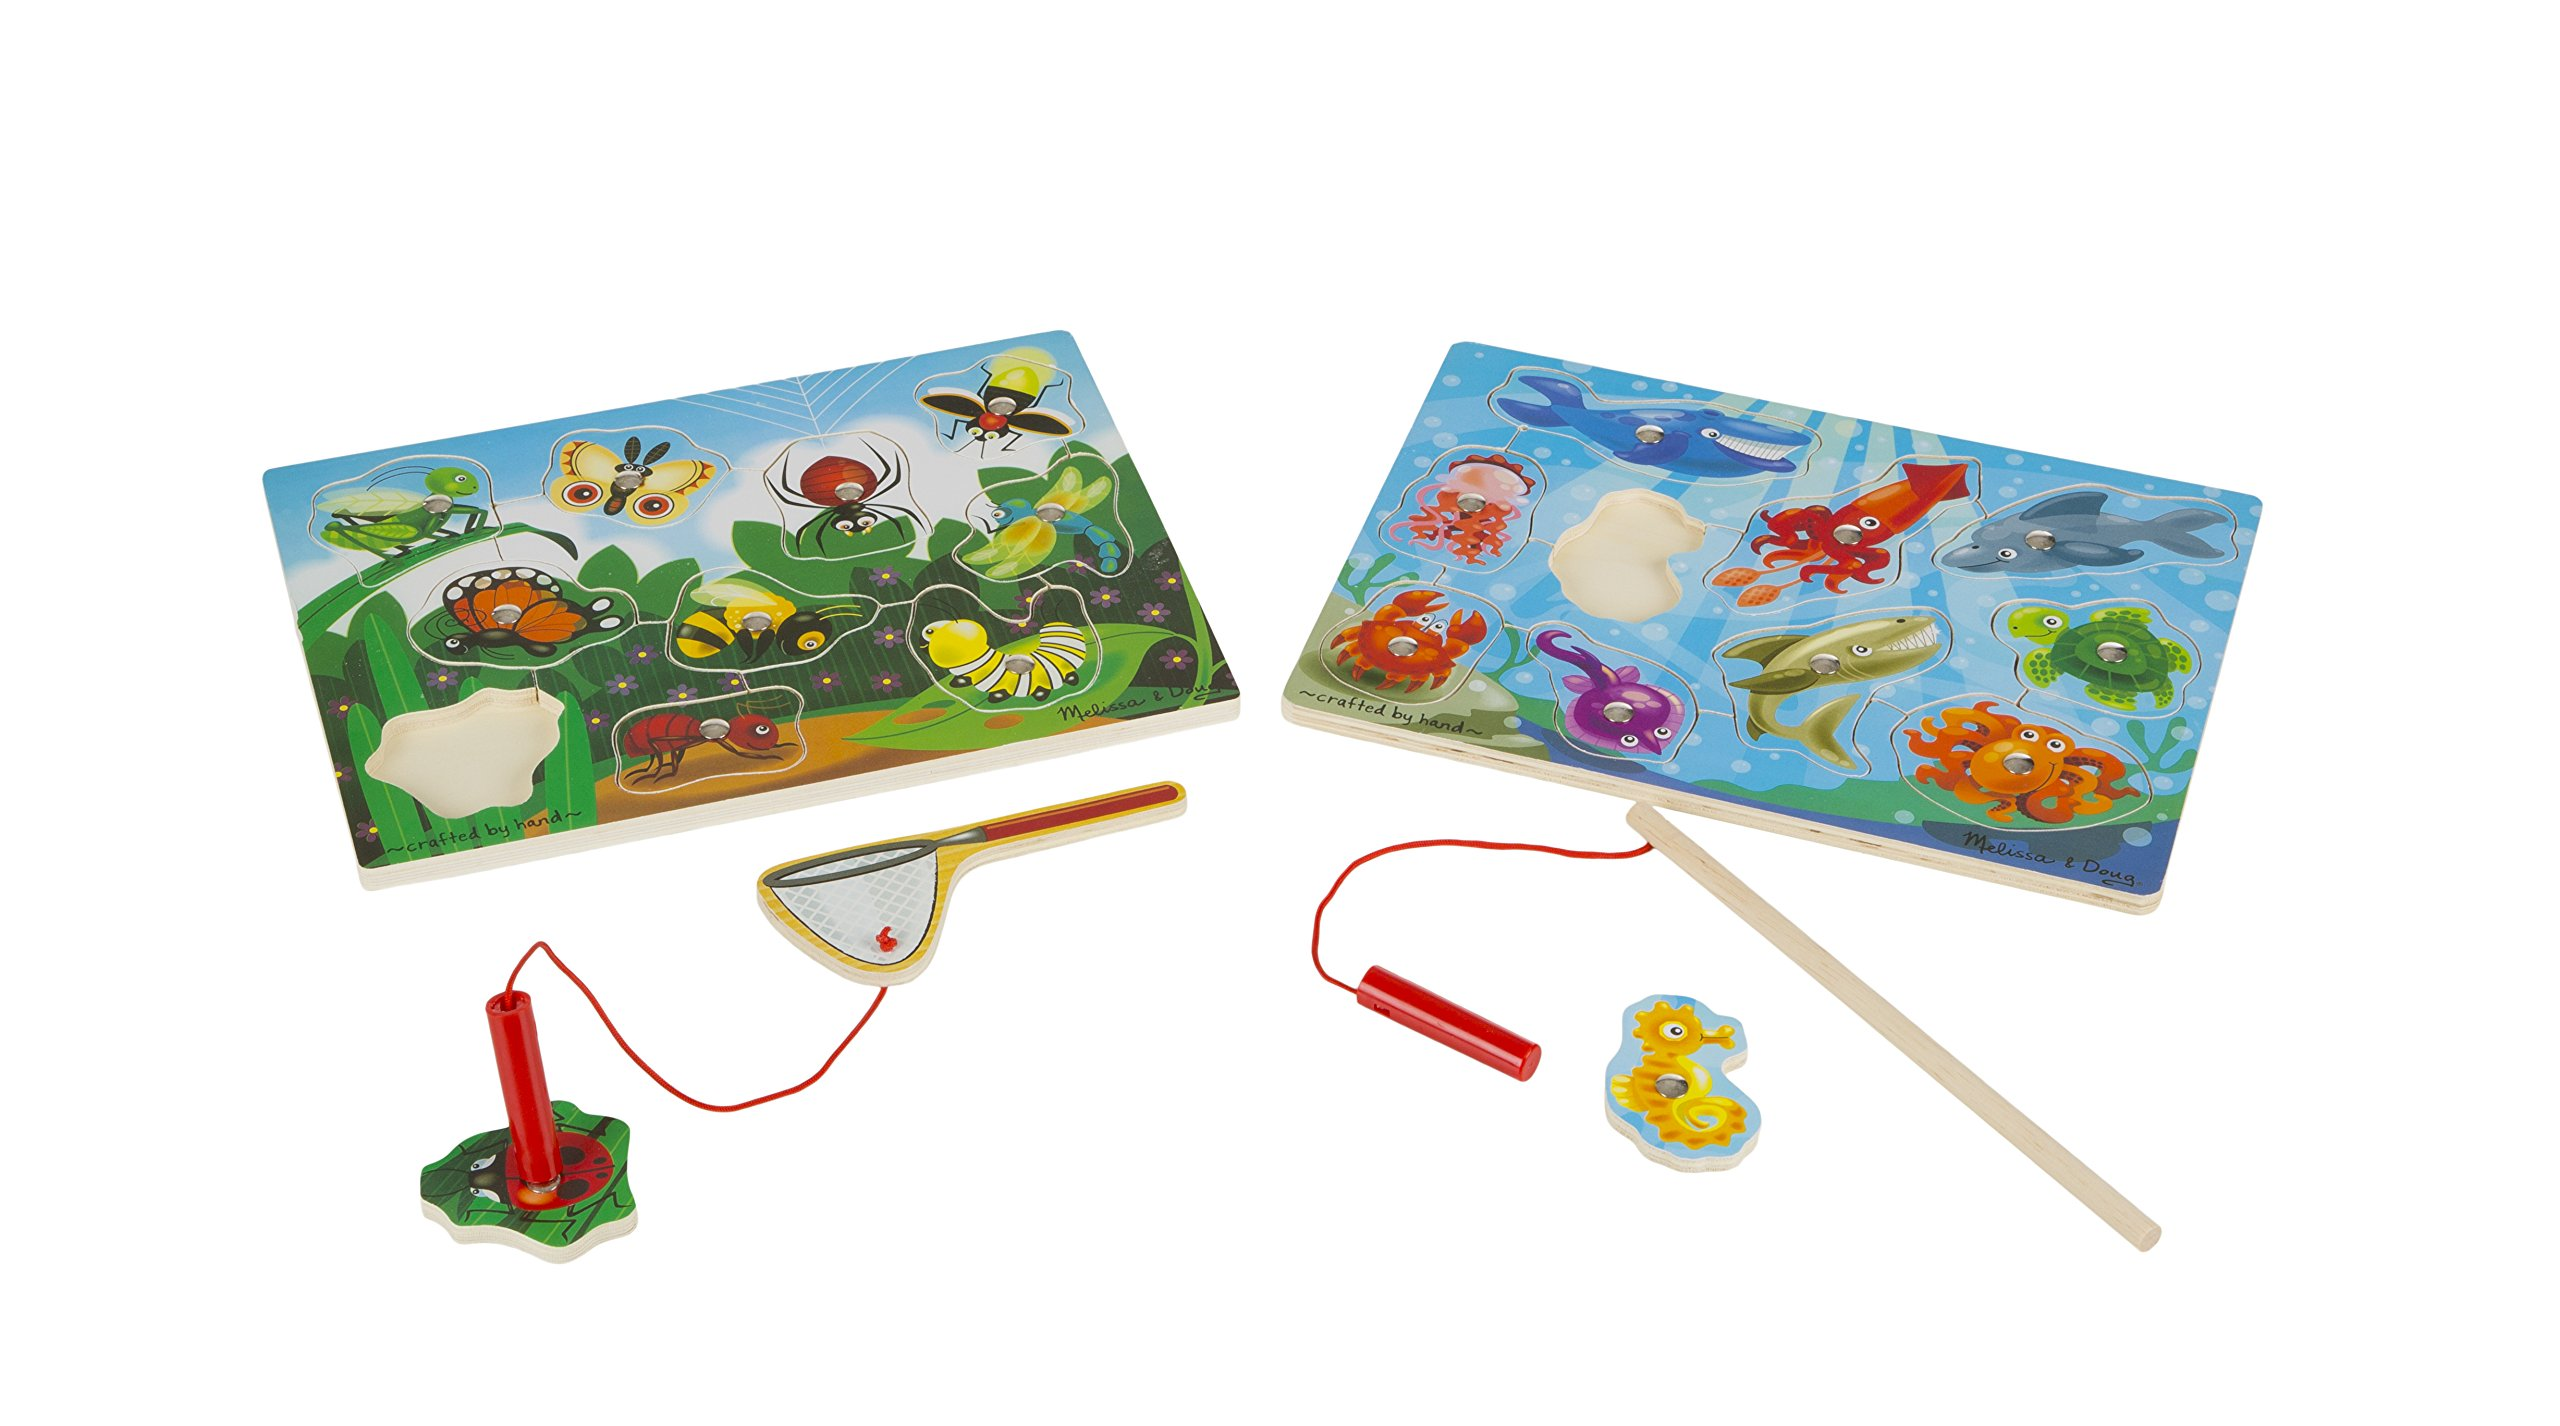 Melissa & Doug Magnetic Wooden Puzzle Game Set: Fishing and Bug Catching by Melissa & Doug (Image #5)